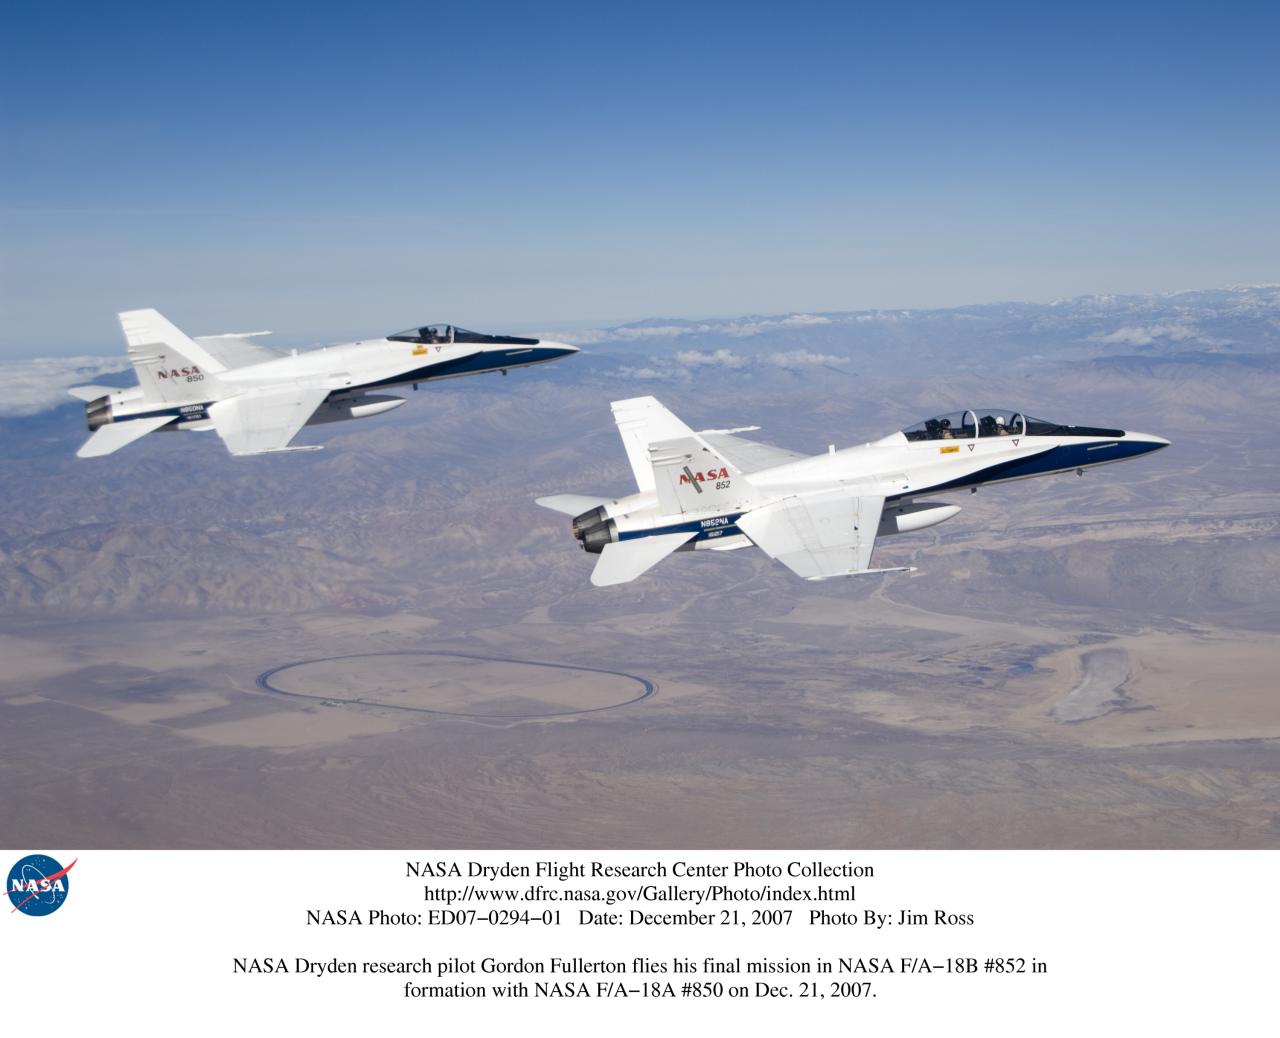 Nasa dryden flight research pilots photo collection for Nasa air study